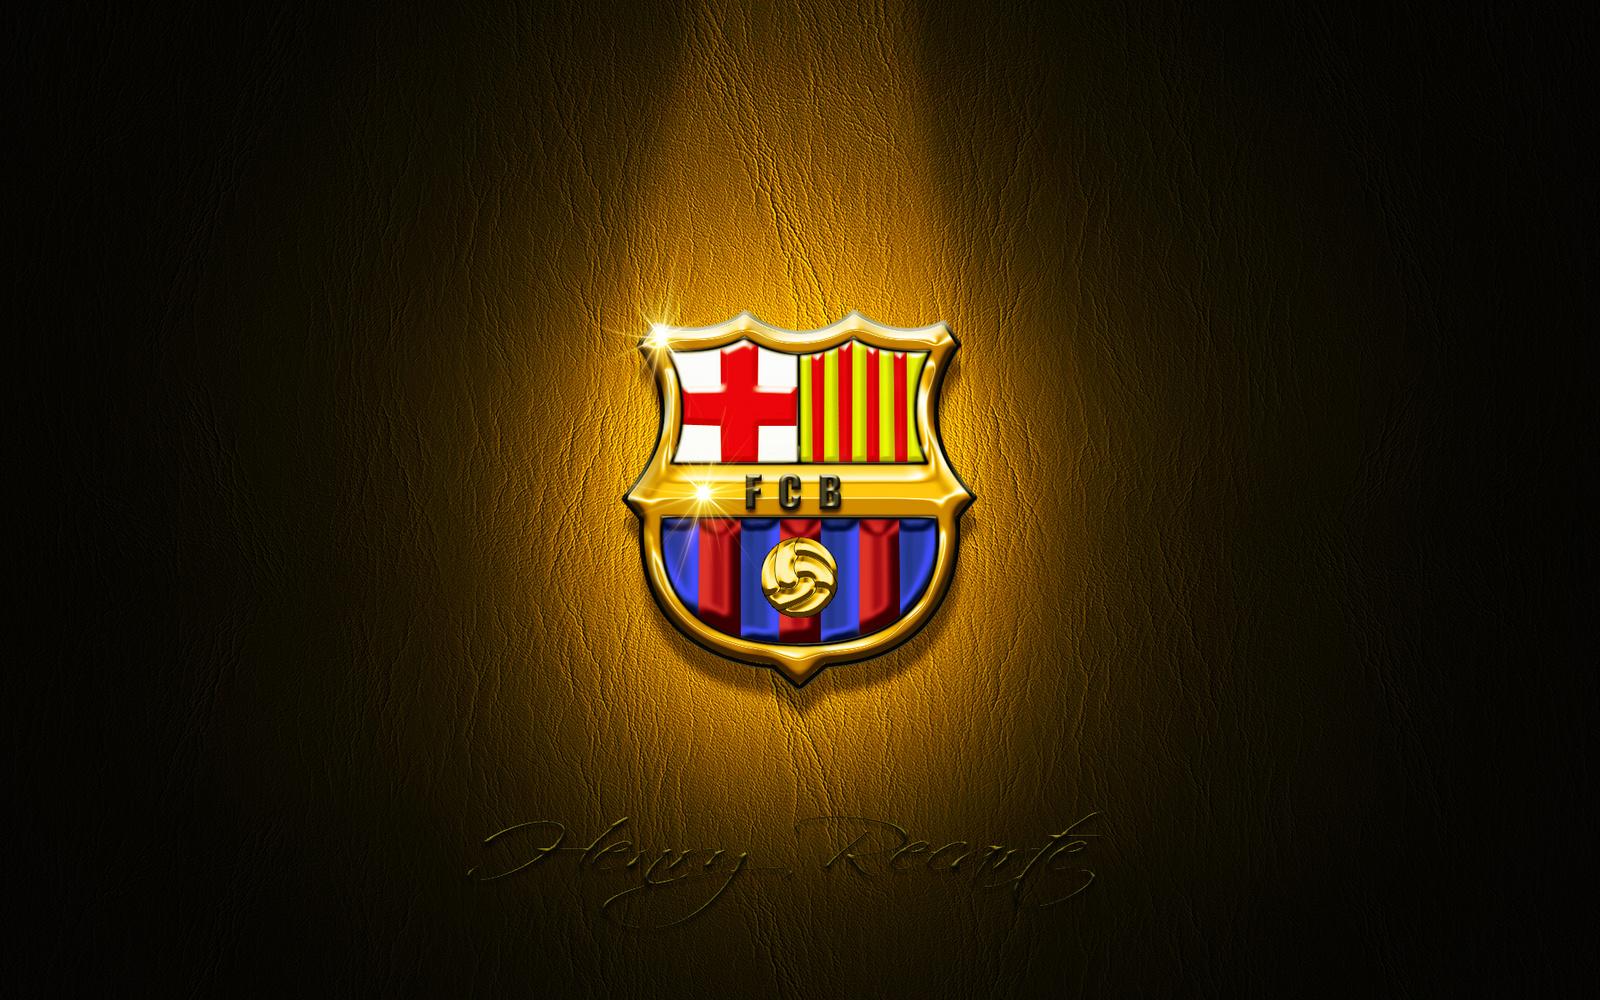 FC Barcelona HD Wallpapers 2012 2013 1600x1000